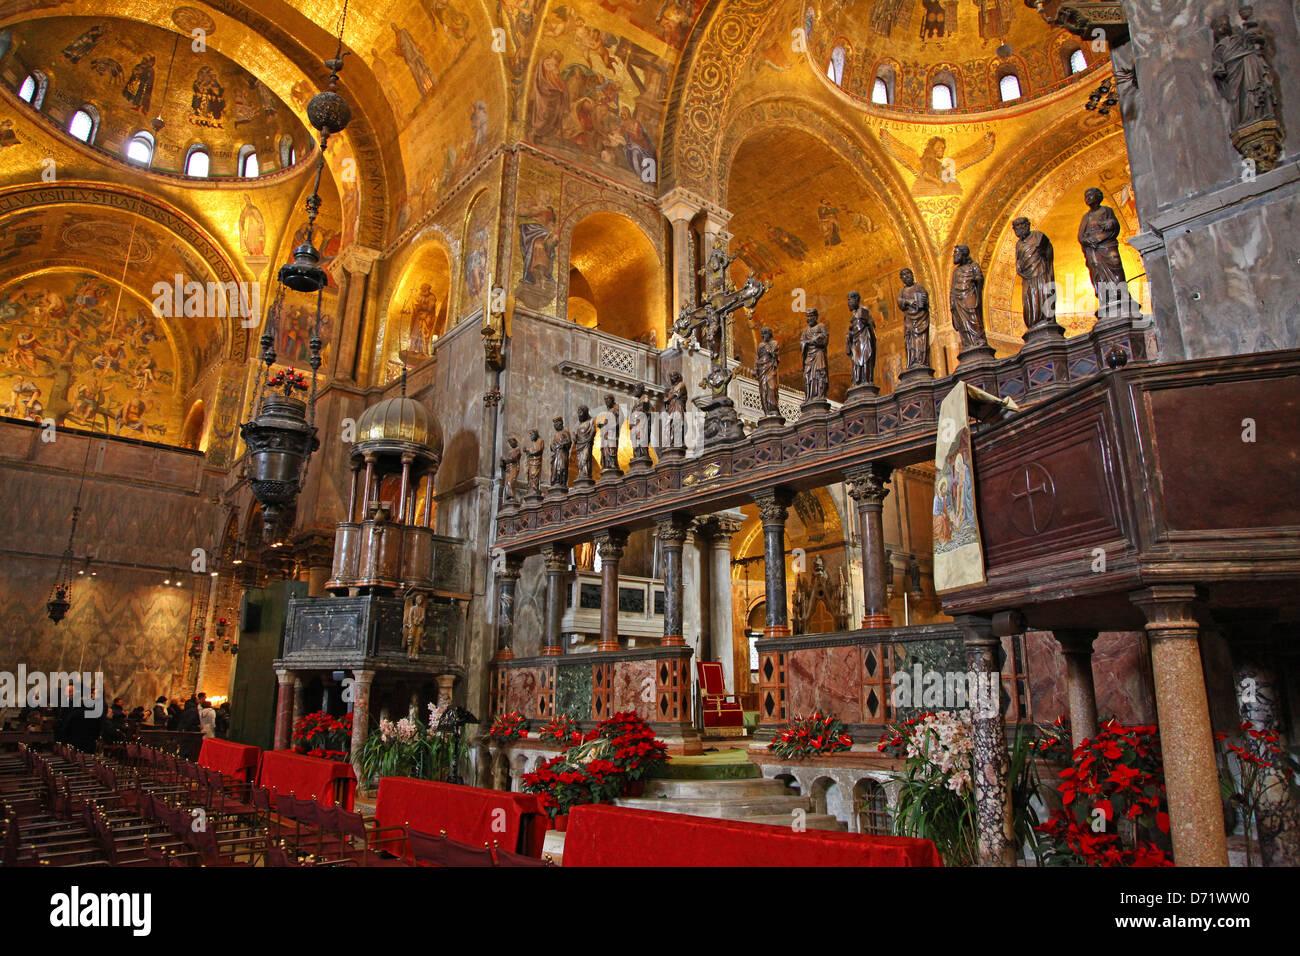 interior-view-of-saint-marks-basilica-or-the-basilica-di-san-marco-D71WW0.jpg